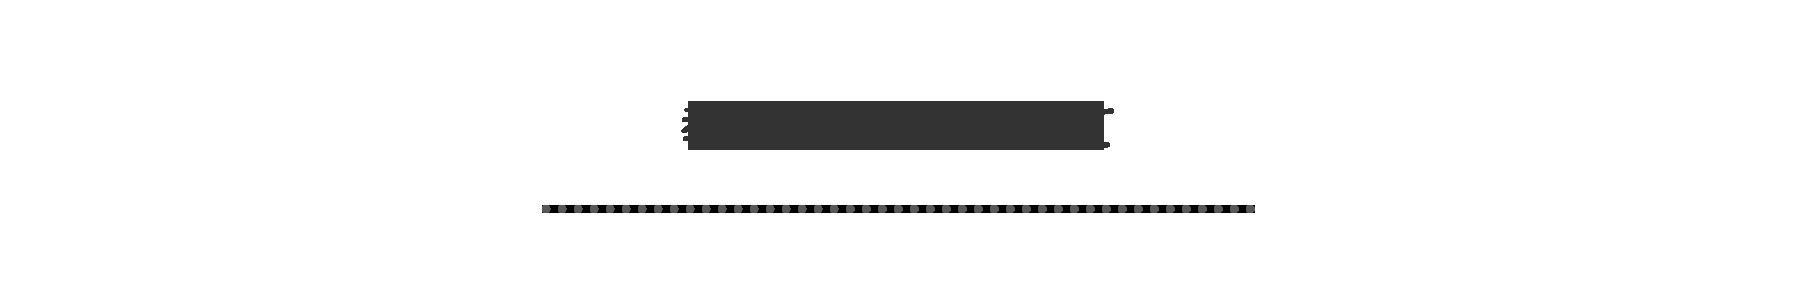 title_教員採用について